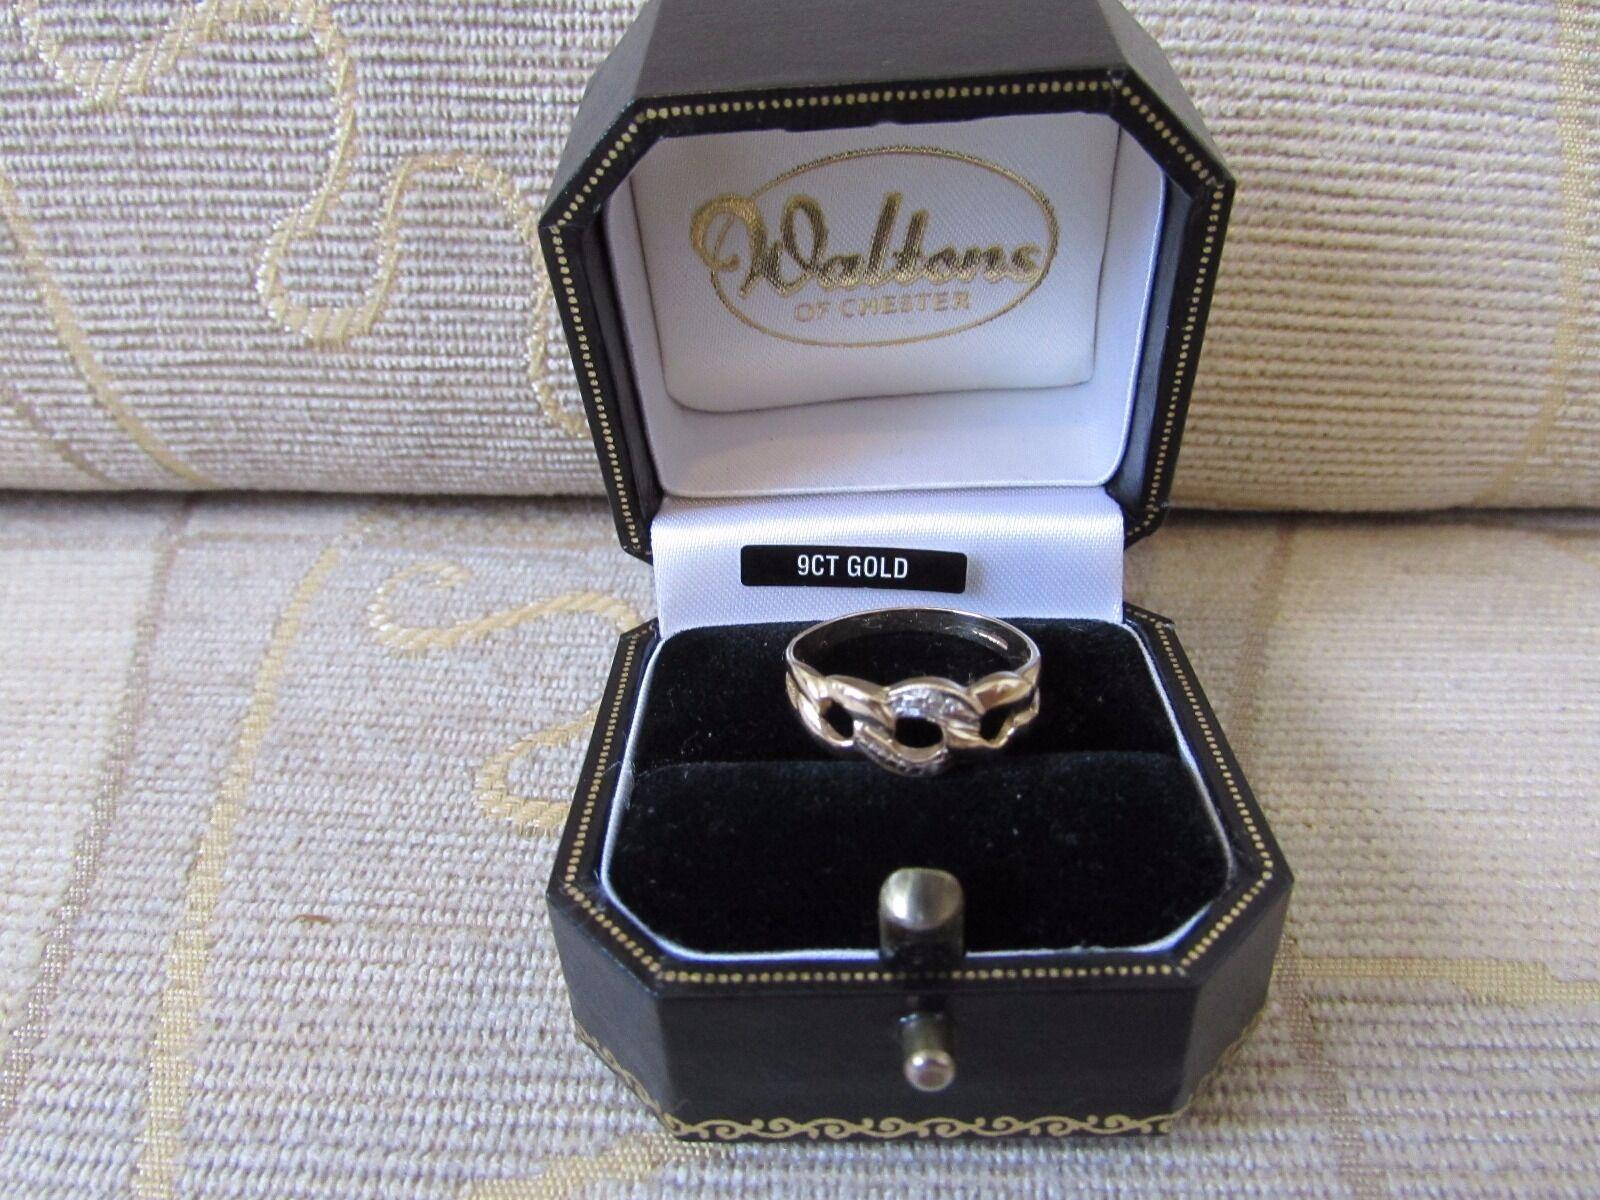 Elegant .375 9CT gold Diamond Stone Twist Ring - Size M, BOXED 1.77g